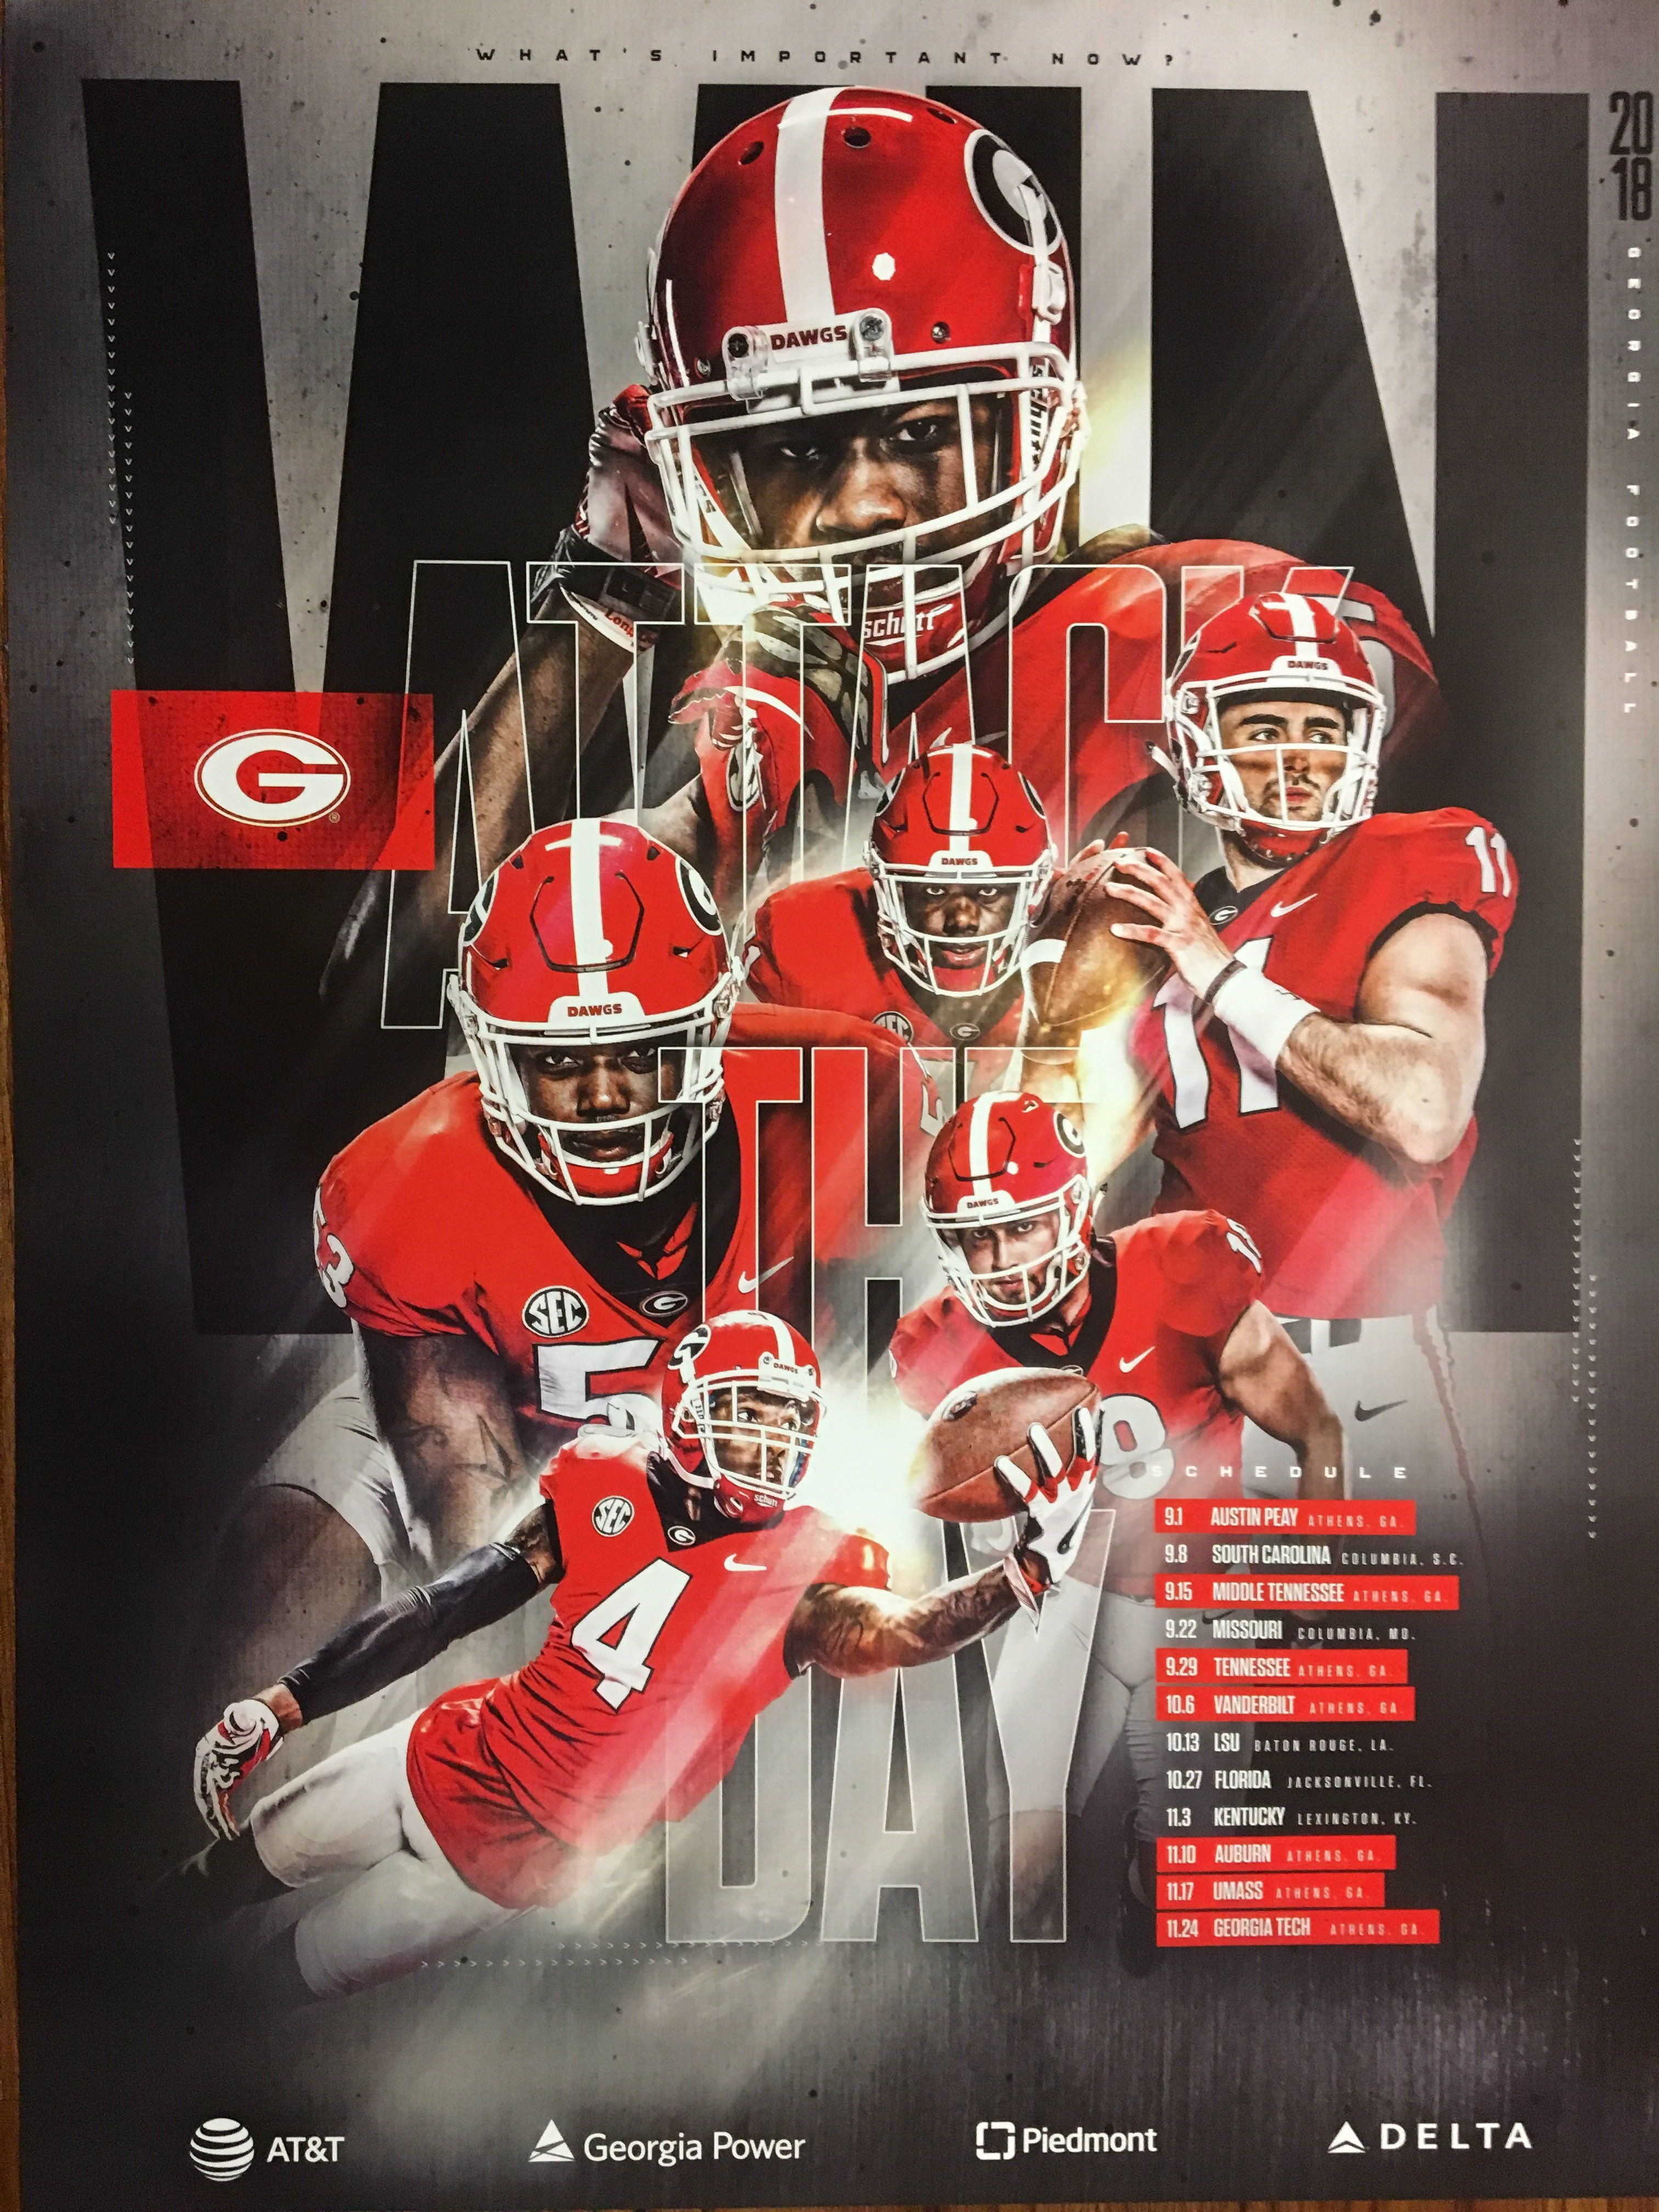 2018 Football Team Schedule Poster Futebol americano